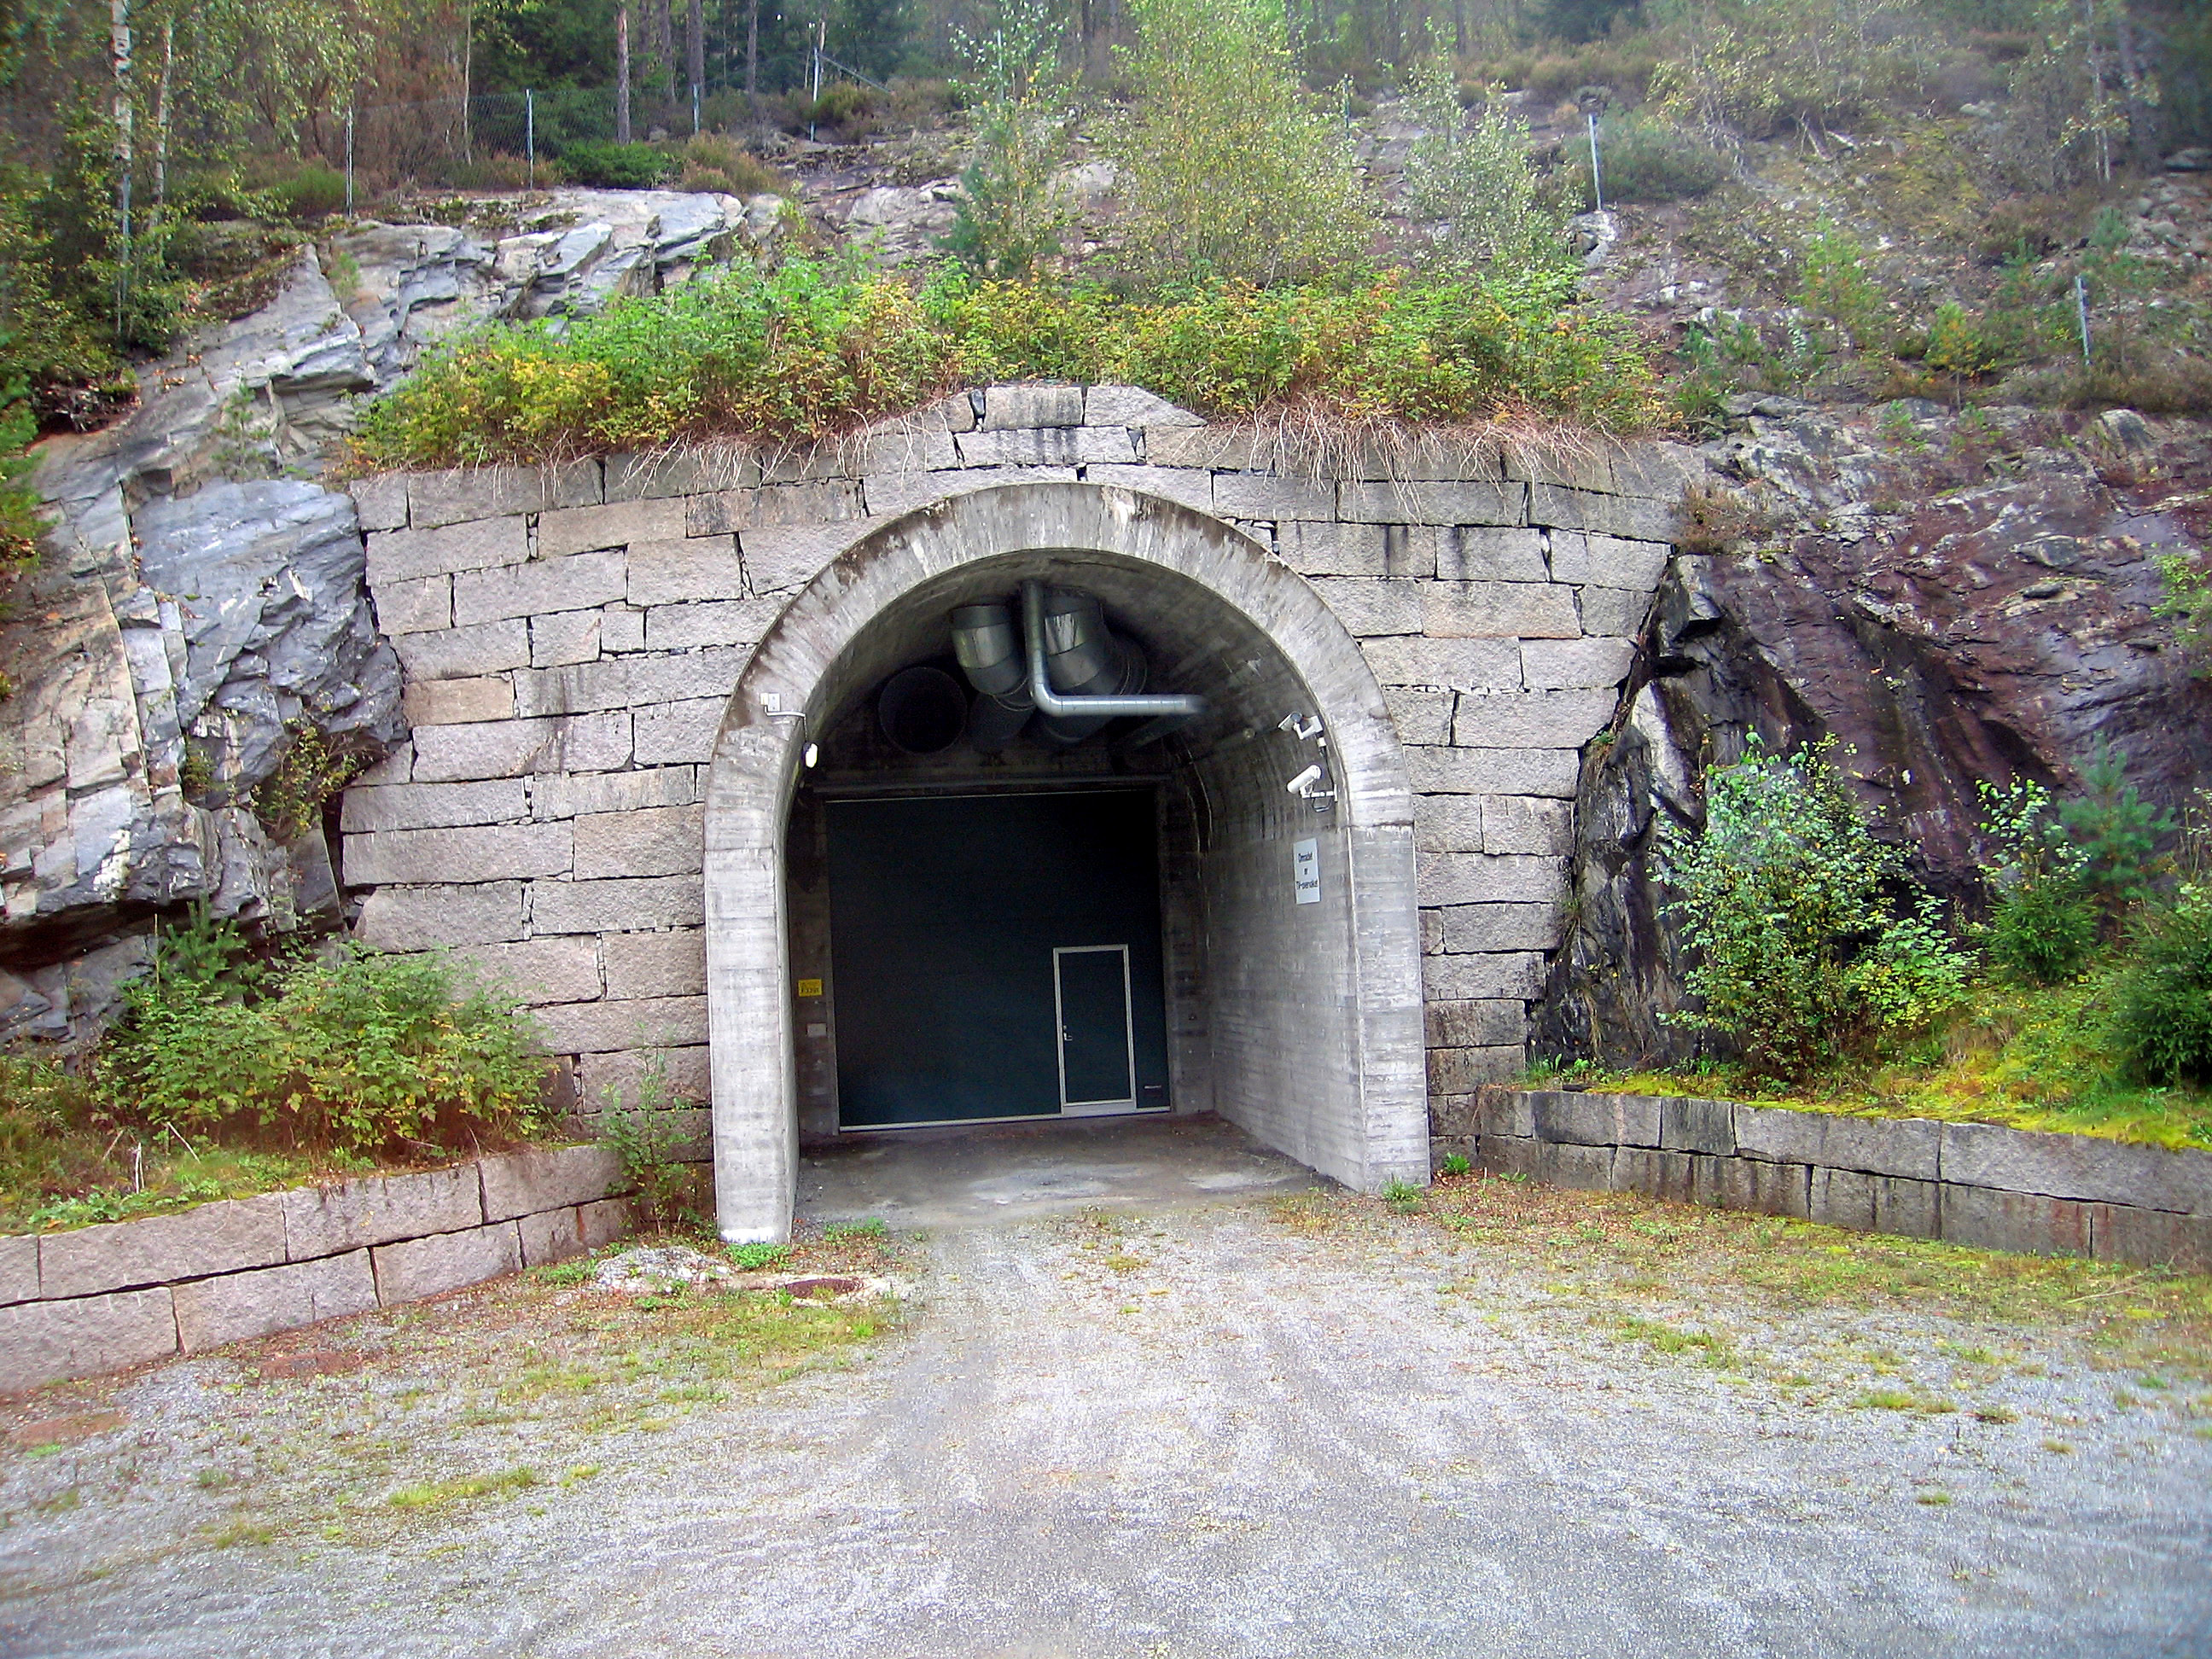 skogsveilaget himdalen fet kommune